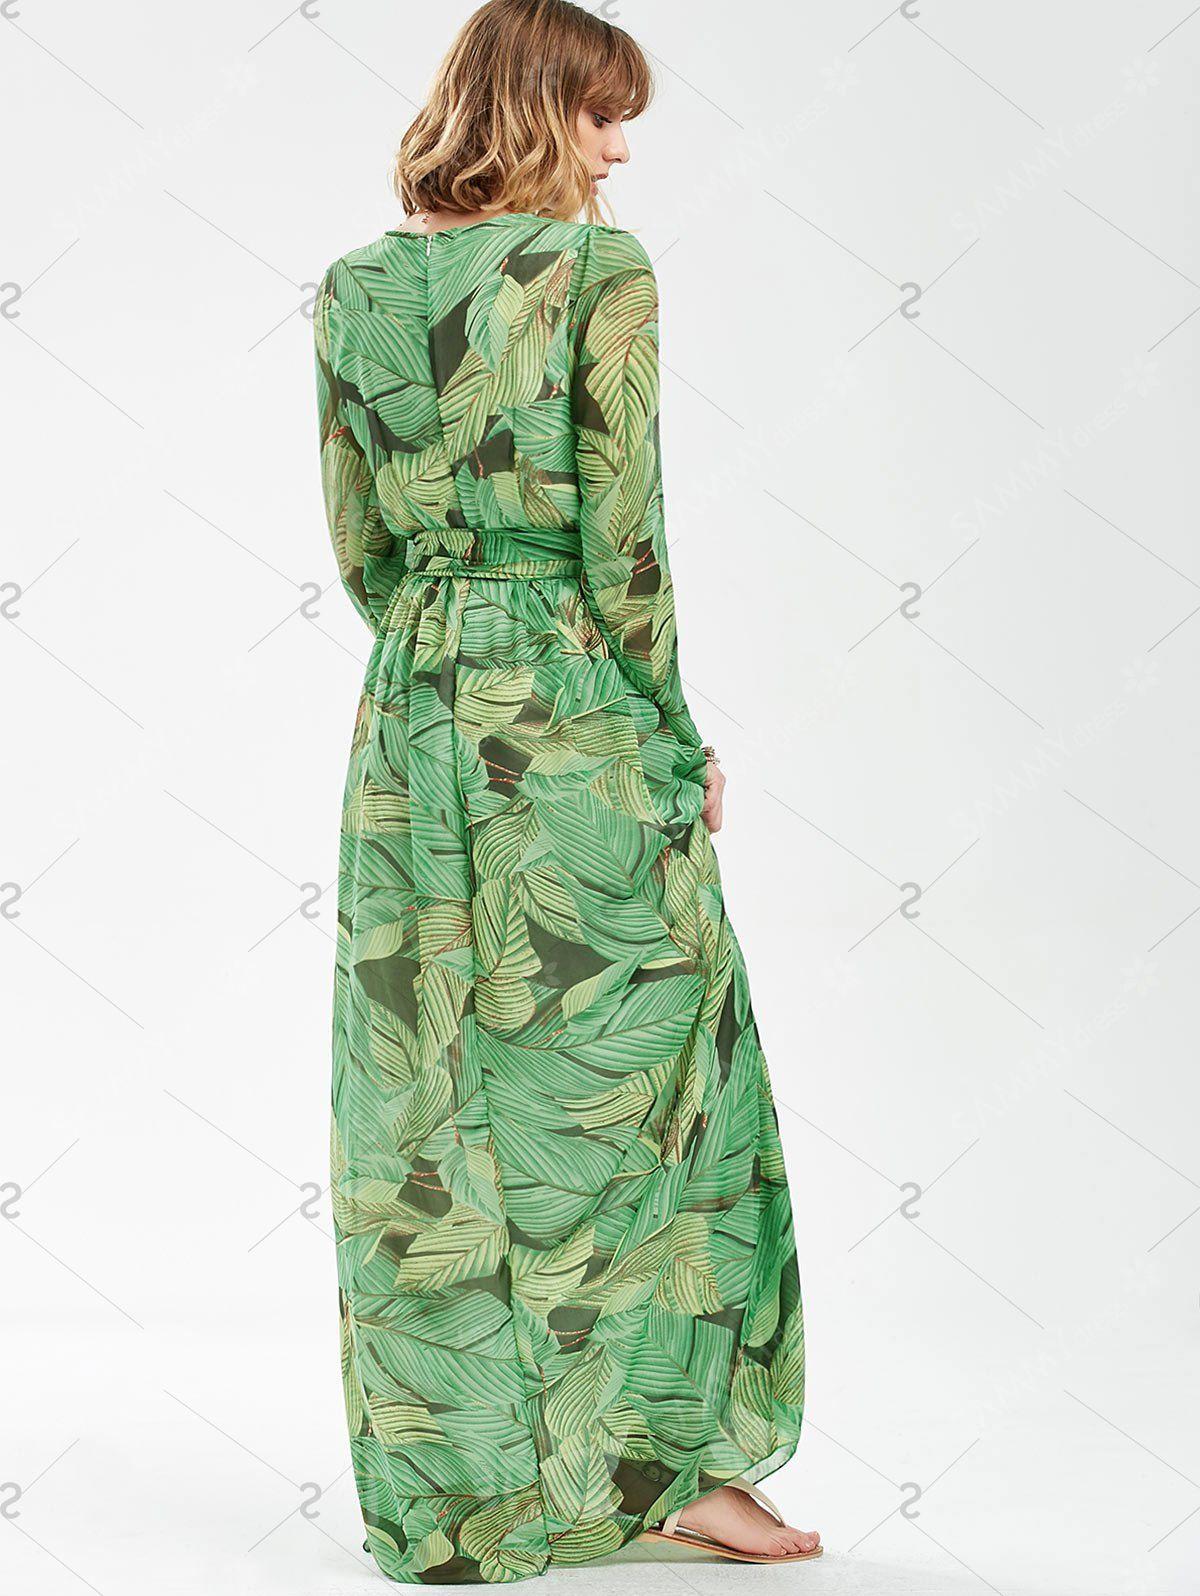 Tropical print long sleeve floor length dress in green sammydress